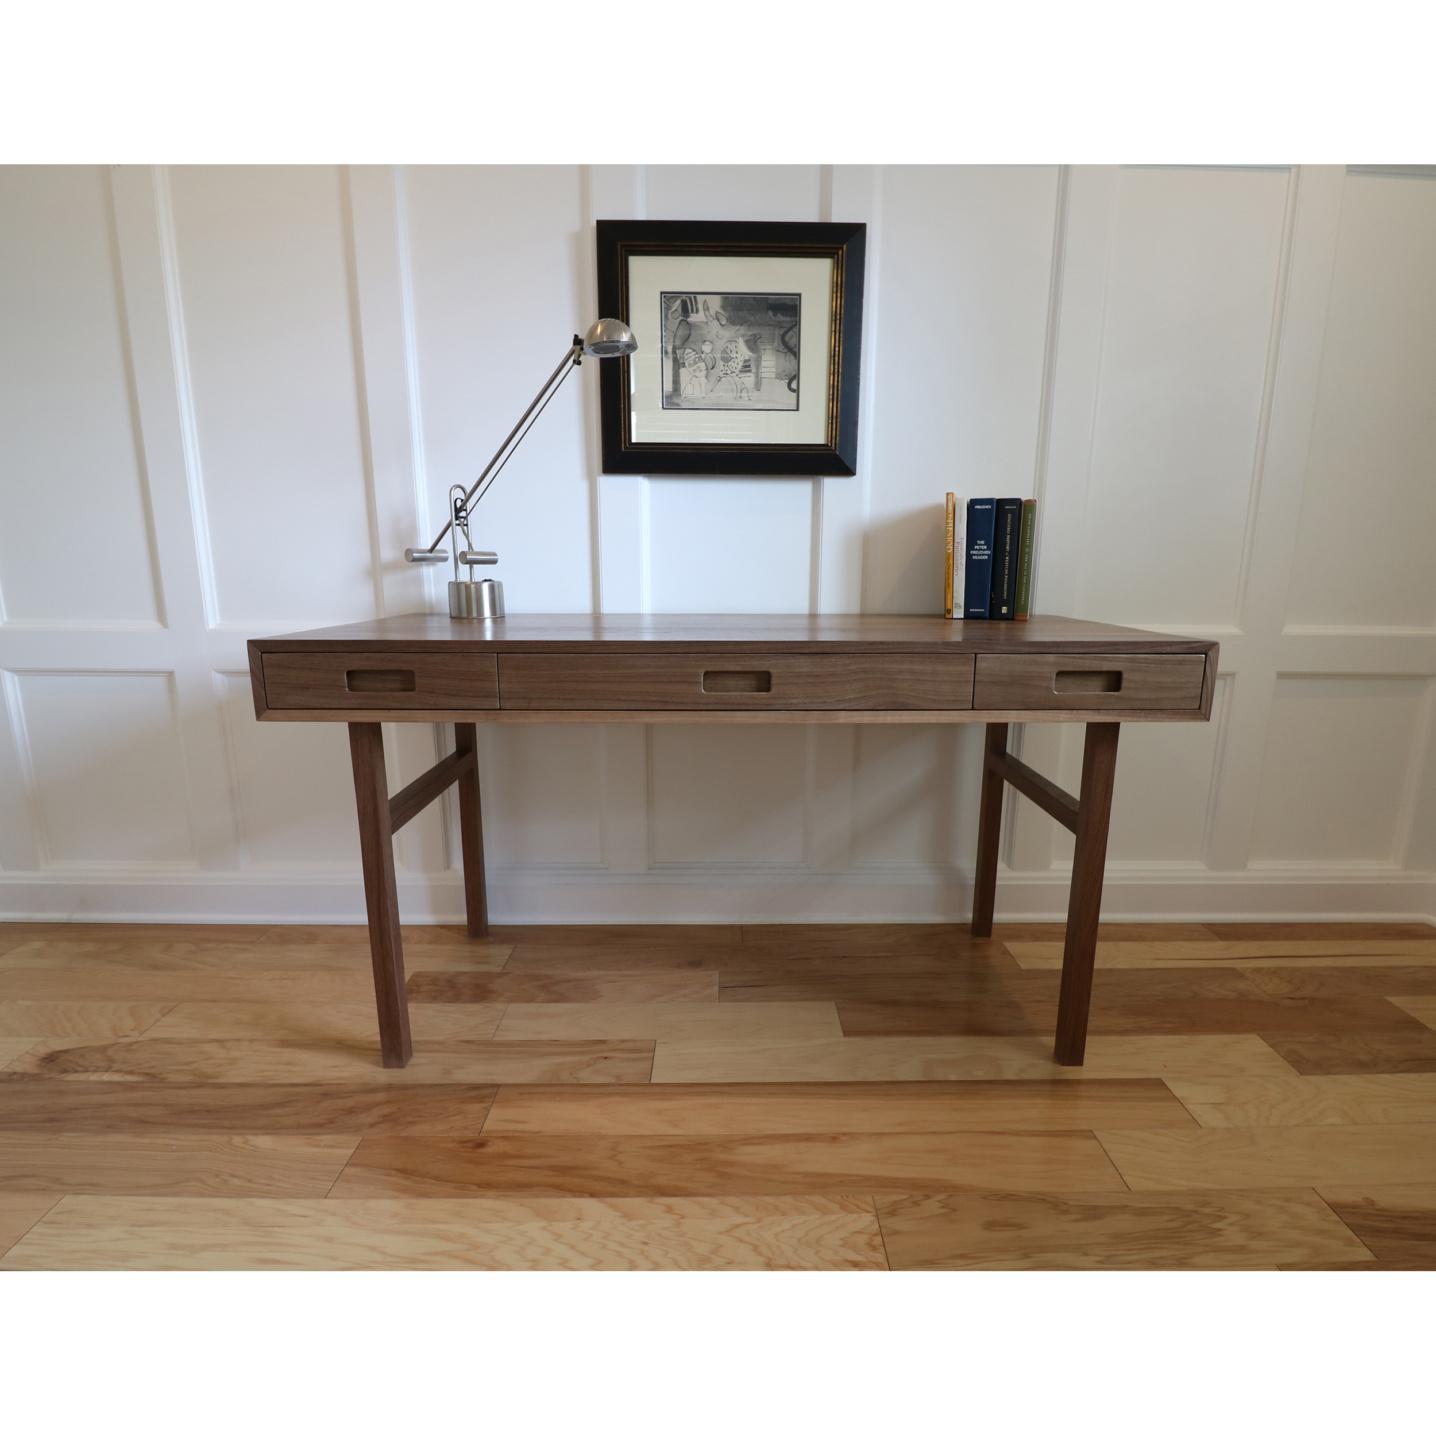 Fine furniture office desk solid walnut woods